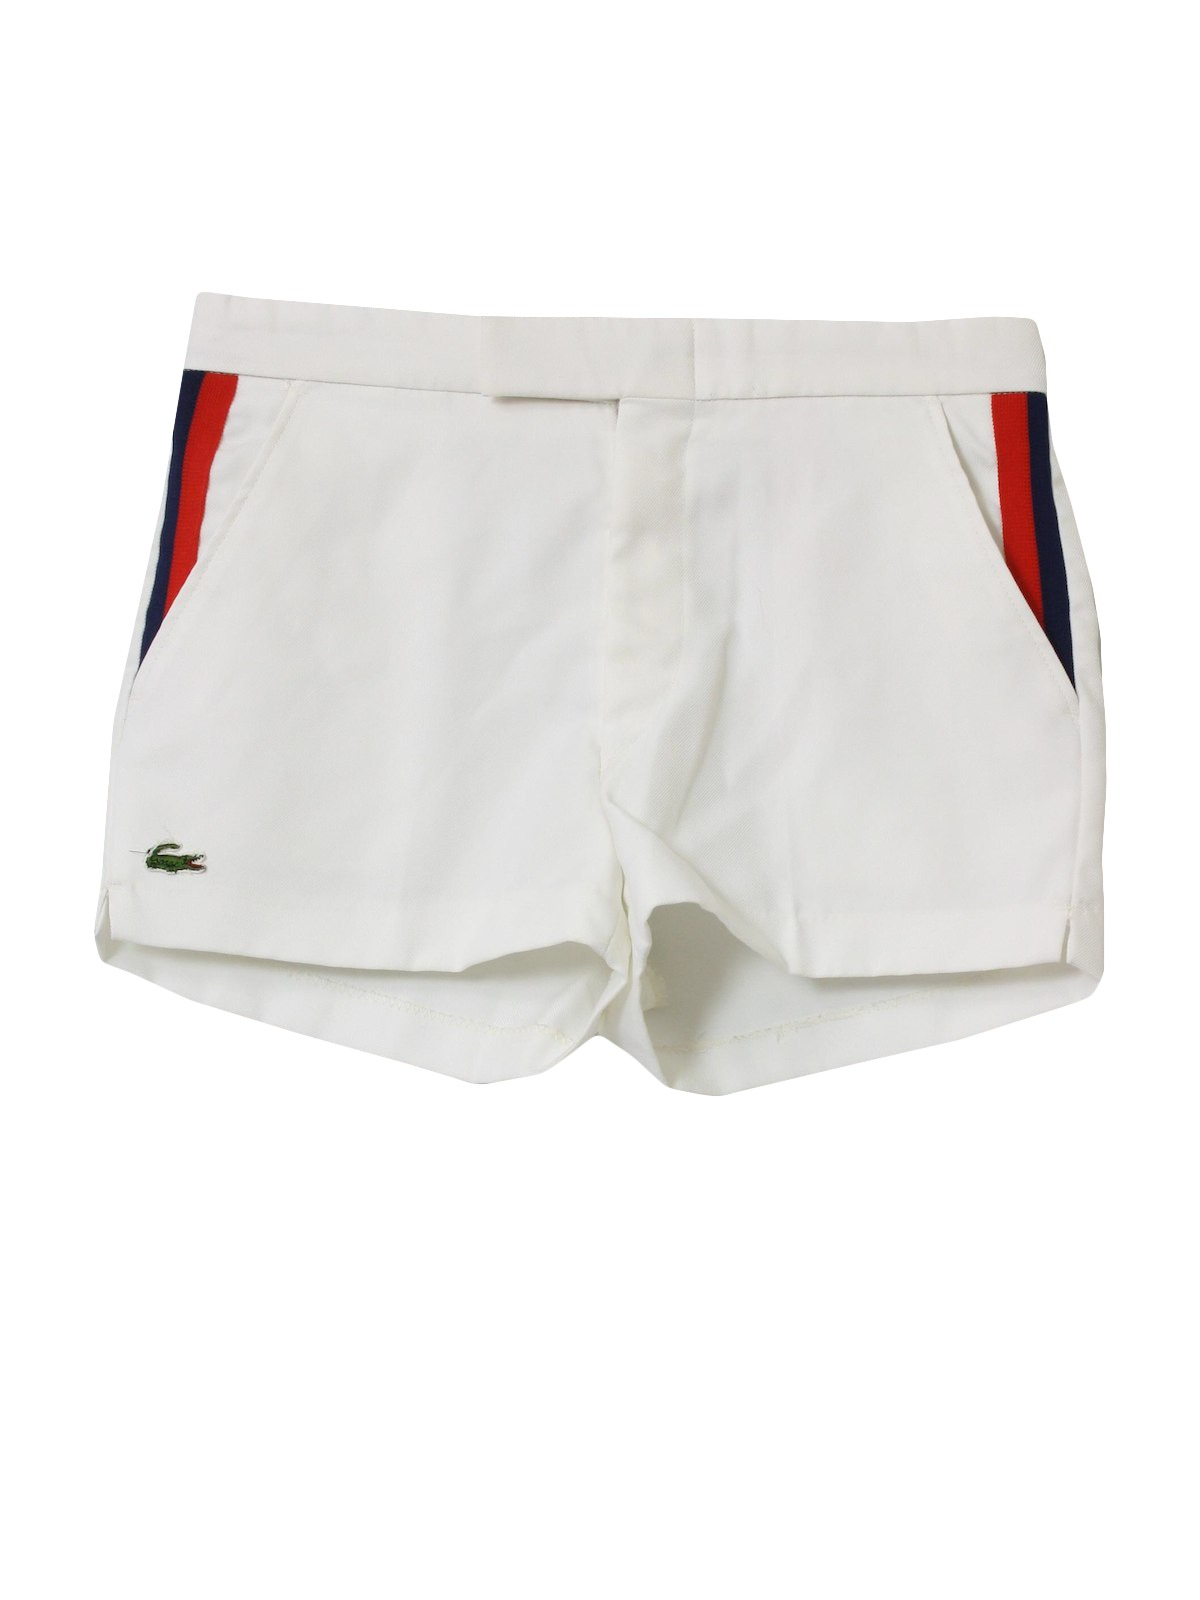 80s Shorts (Izod): 80s -Izod- Mens white background ... | 1200 x 1600 jpeg 91kB